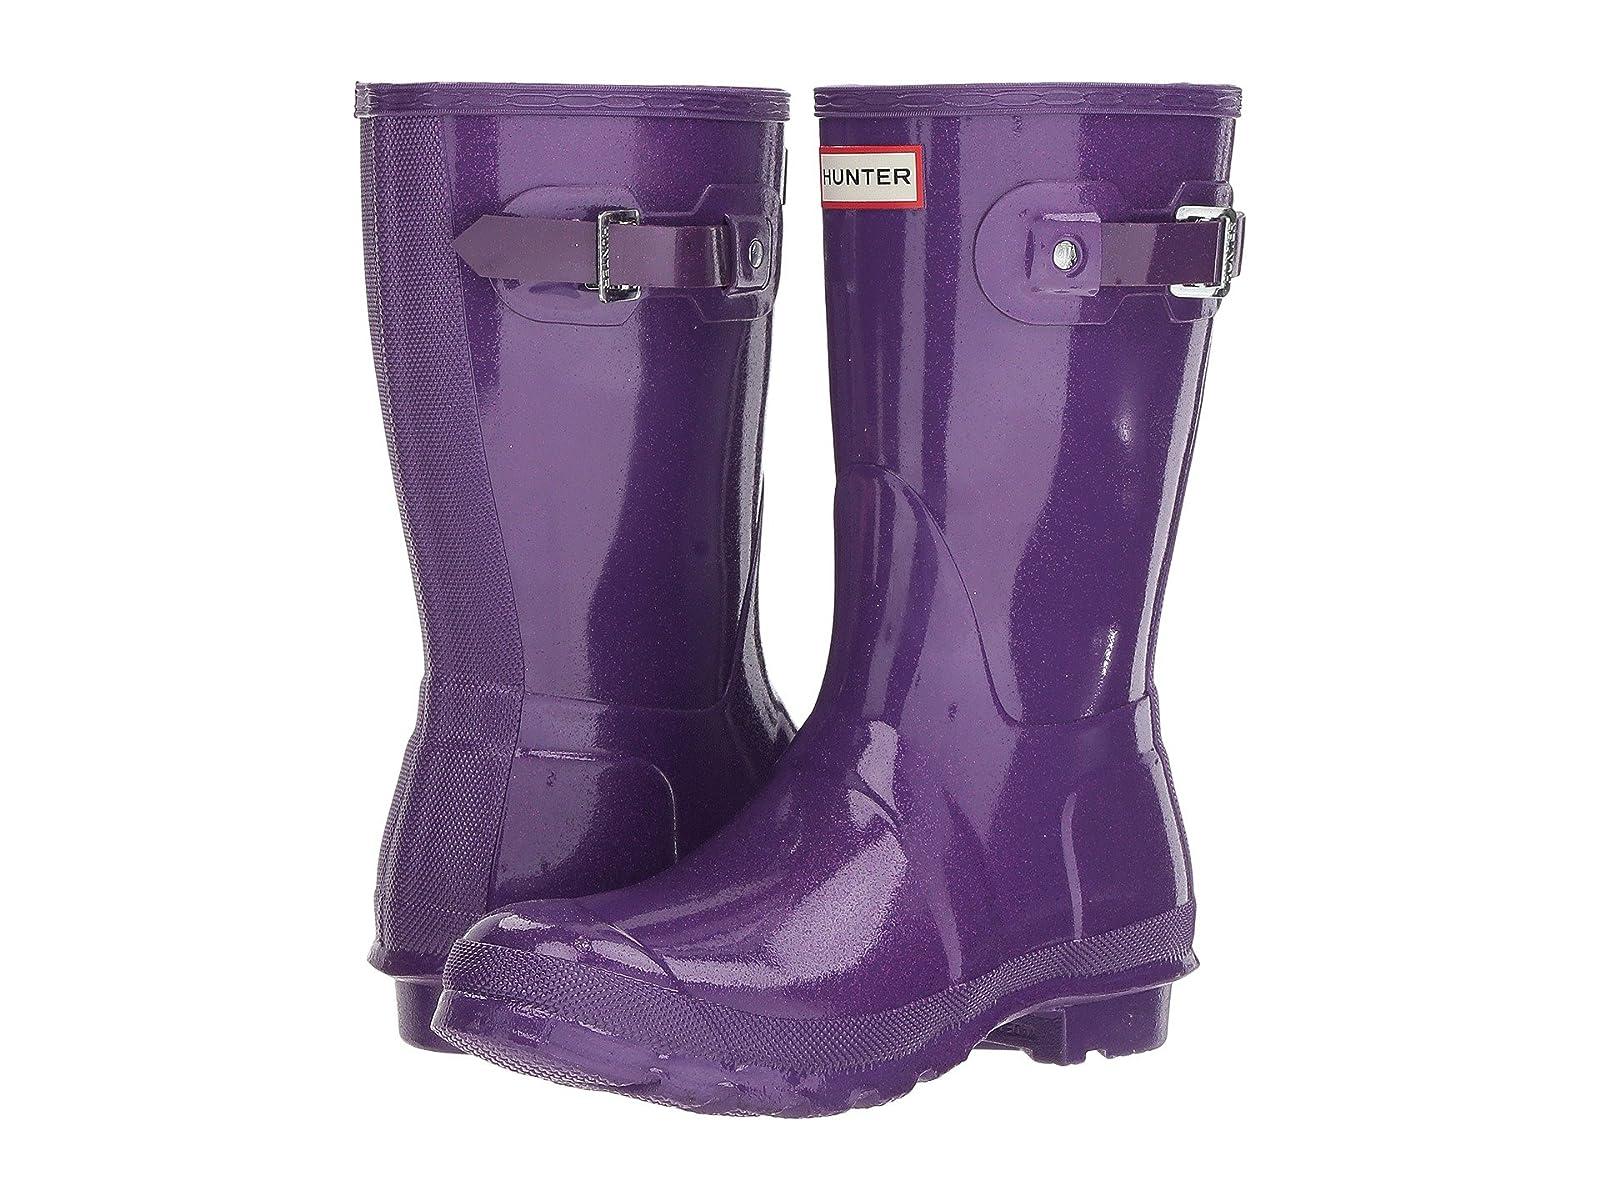 Hunter Original Starcloud Short Rain BootsAffordable and distinctive shoes